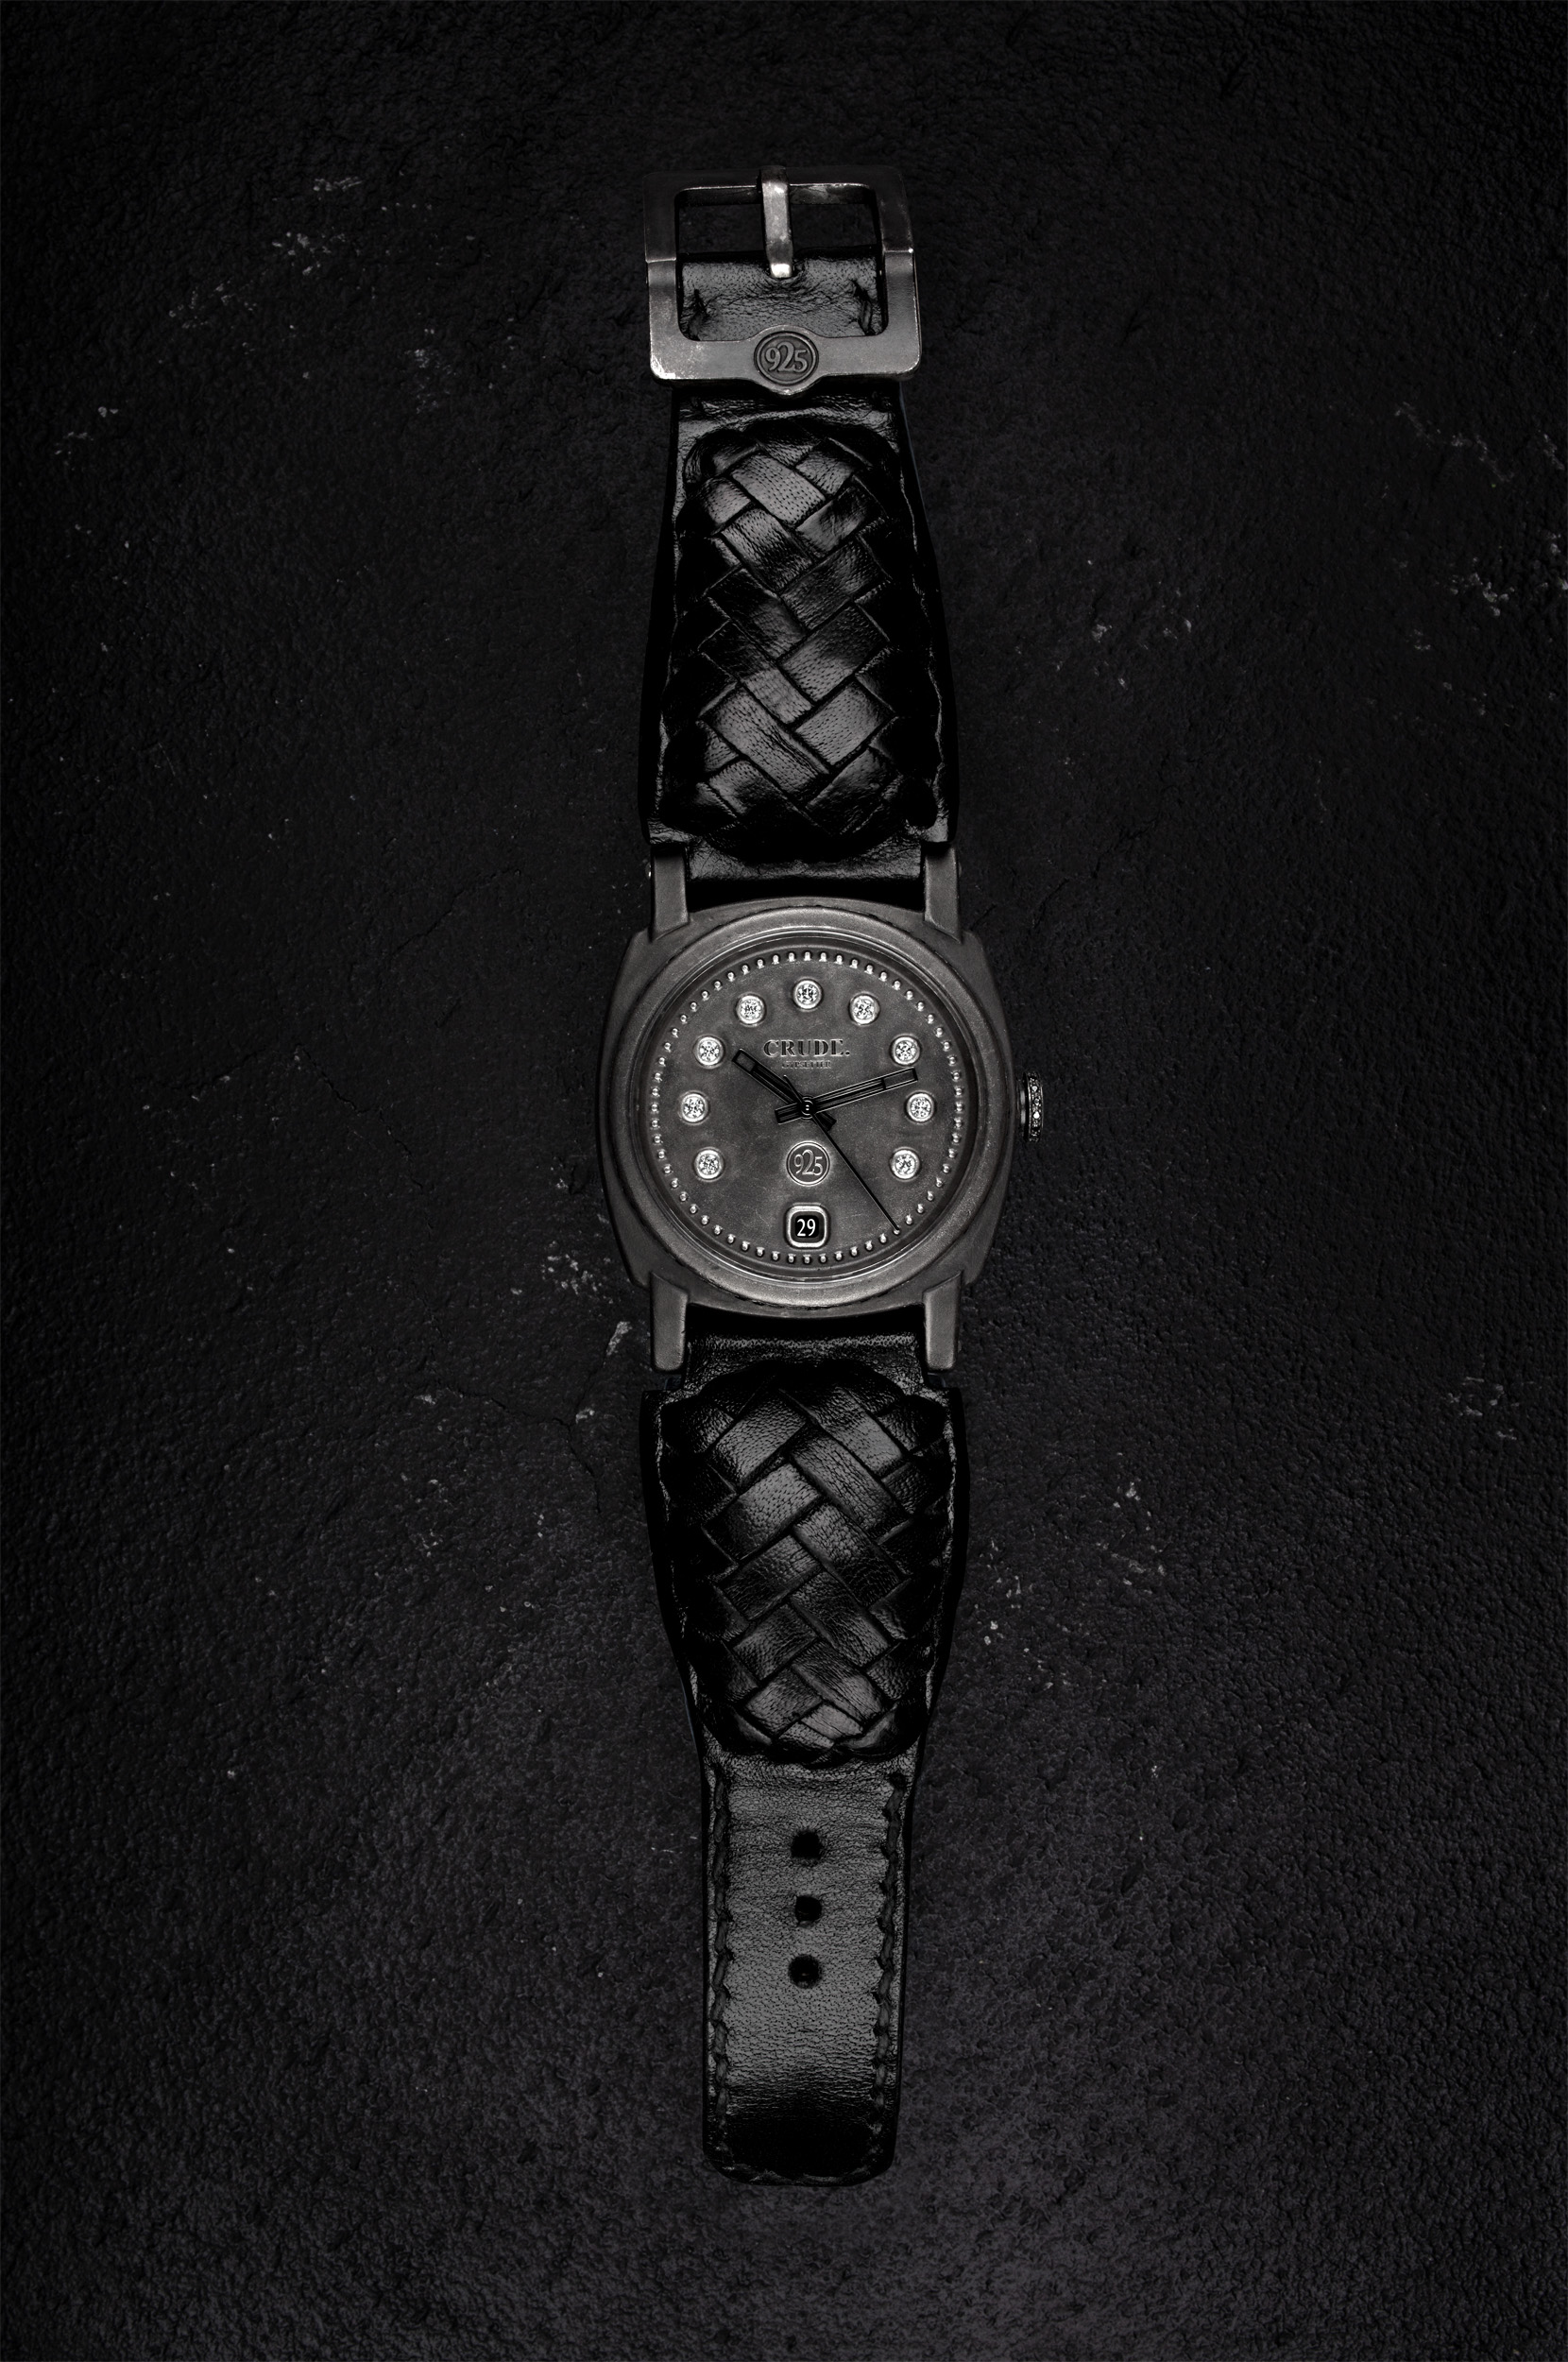 Crude-Modell-7-komplett-schwarz